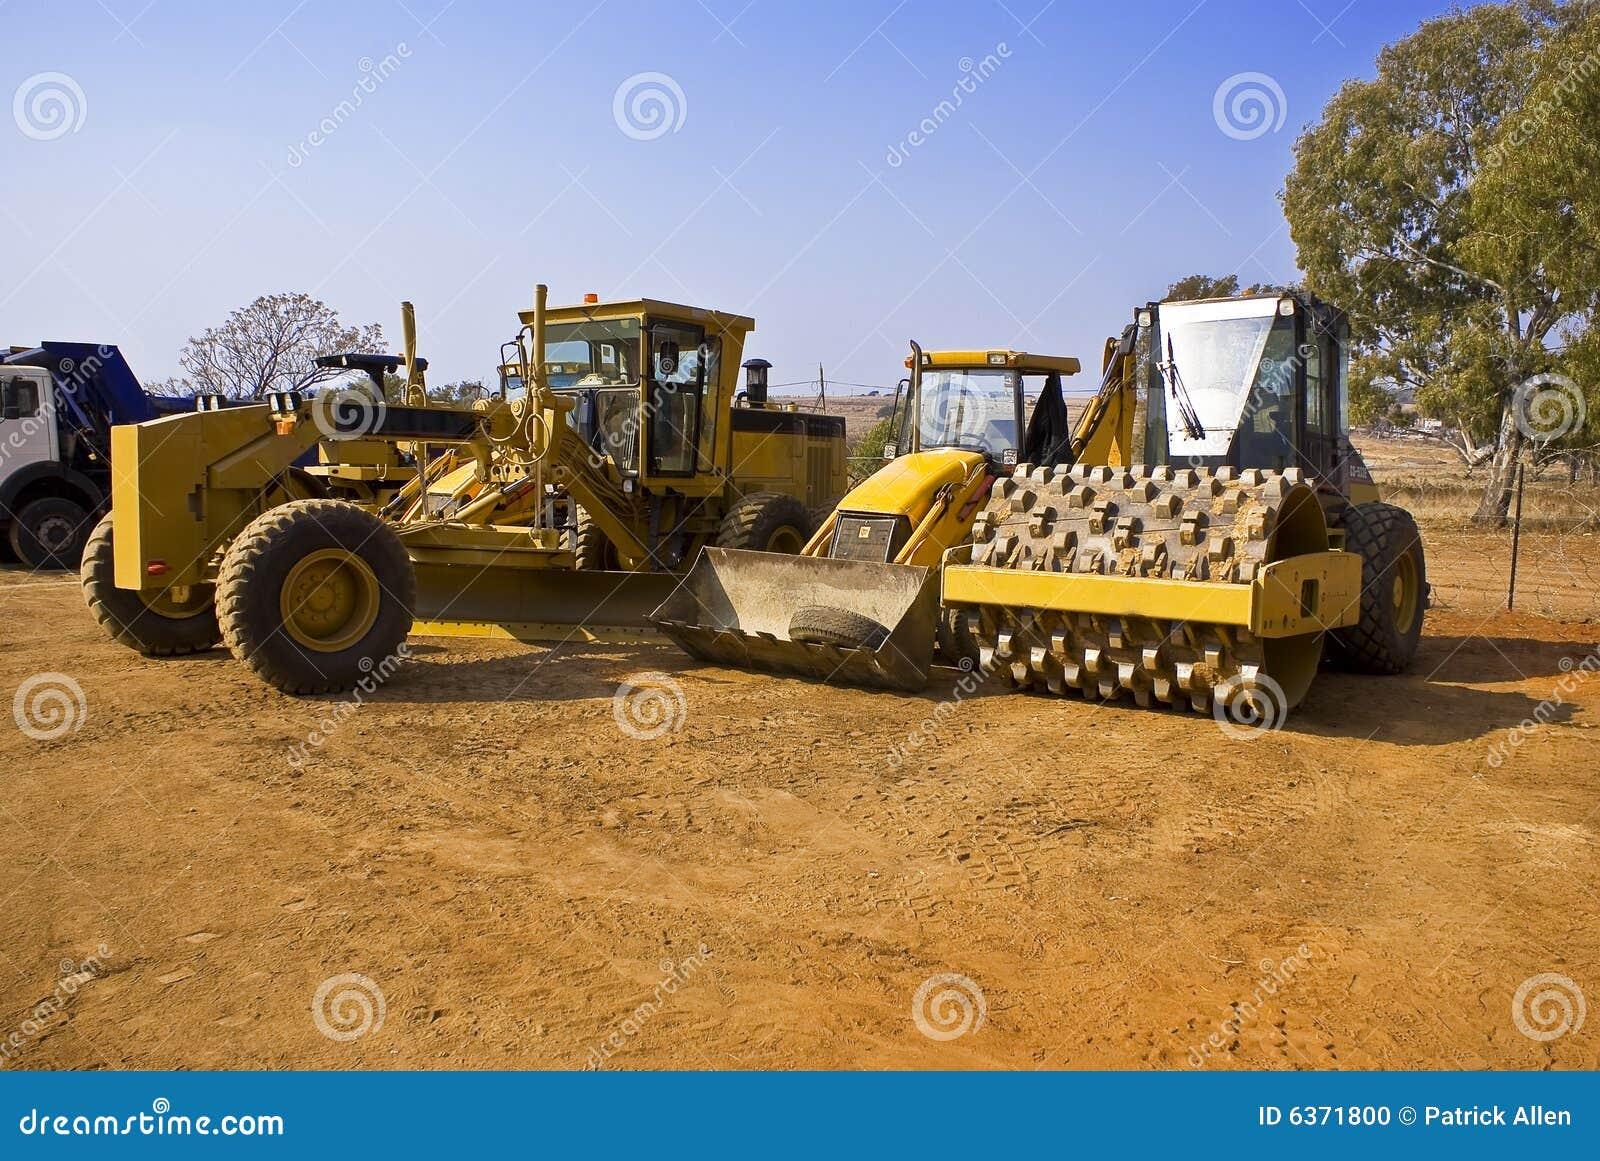 Heavy Duty Construction : Heavy duty construction equipment stock photo image